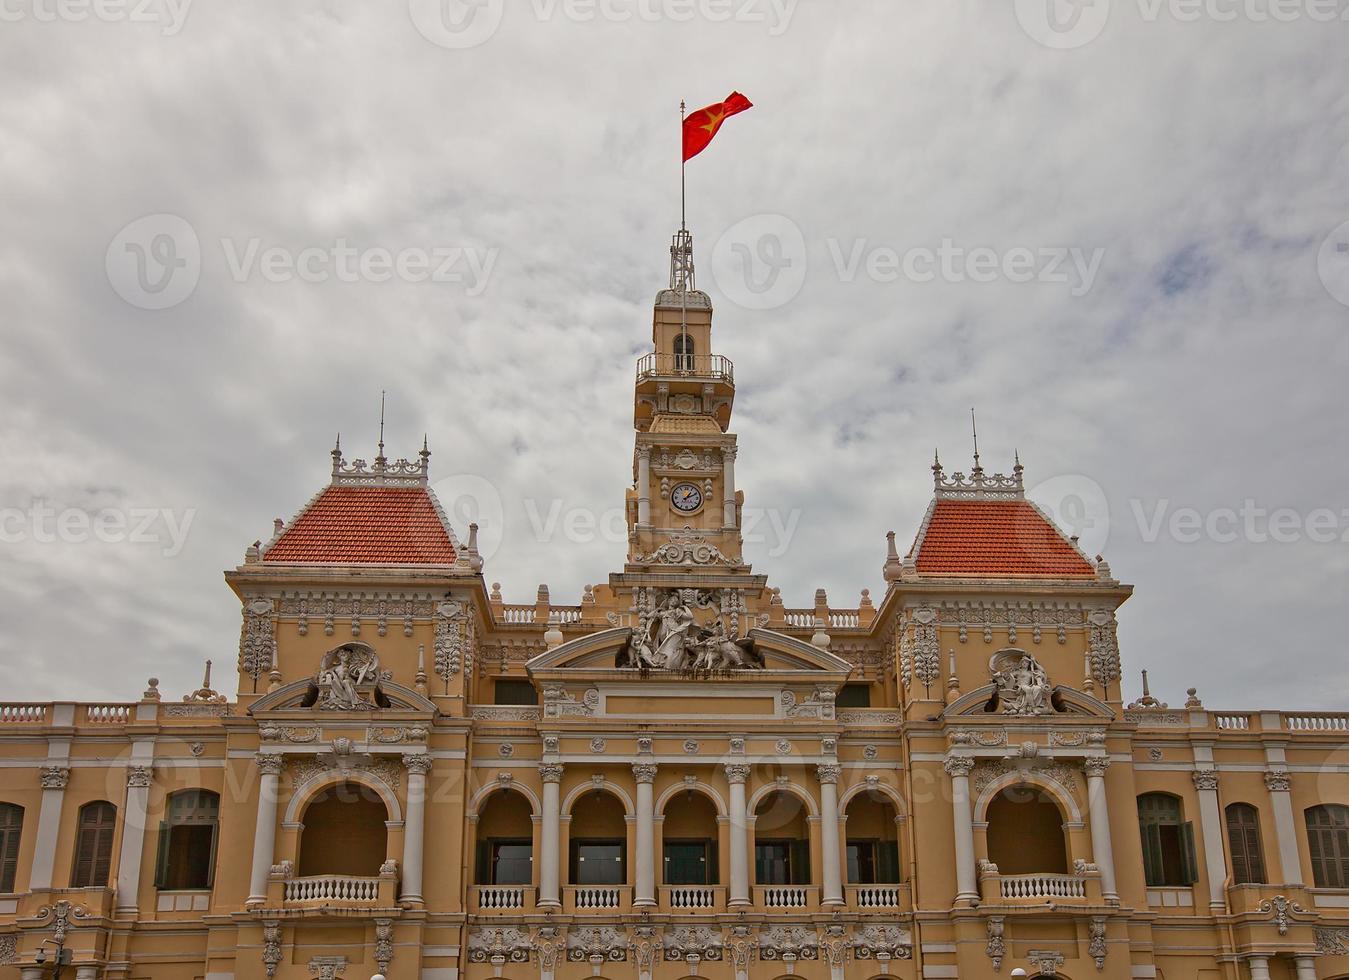 hotel de ville saigon (1908), ho chi minh city, vietnam foto